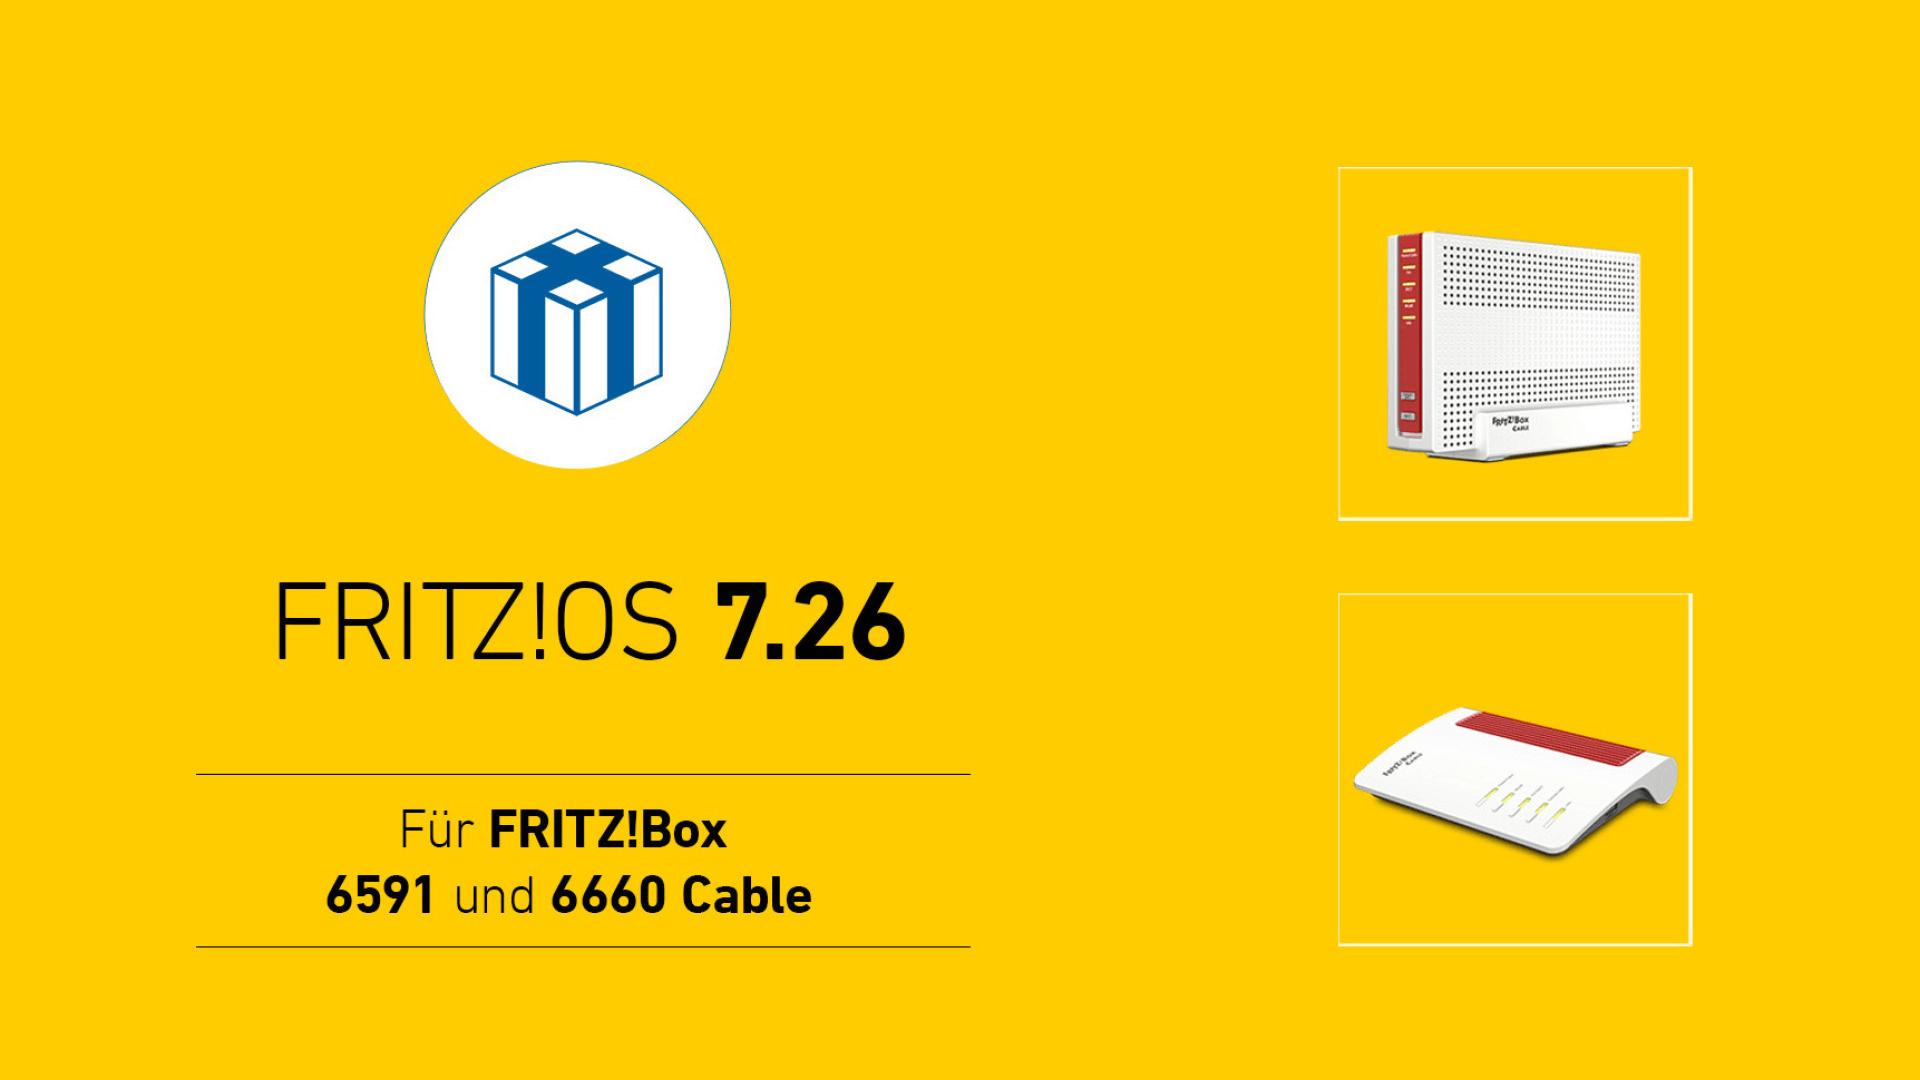 Router, Avm, Fritzbox, FritzOS, Kabel, FritzBox 6591 Cable, FritzBox 6660 Cable, FritzOS 7.26